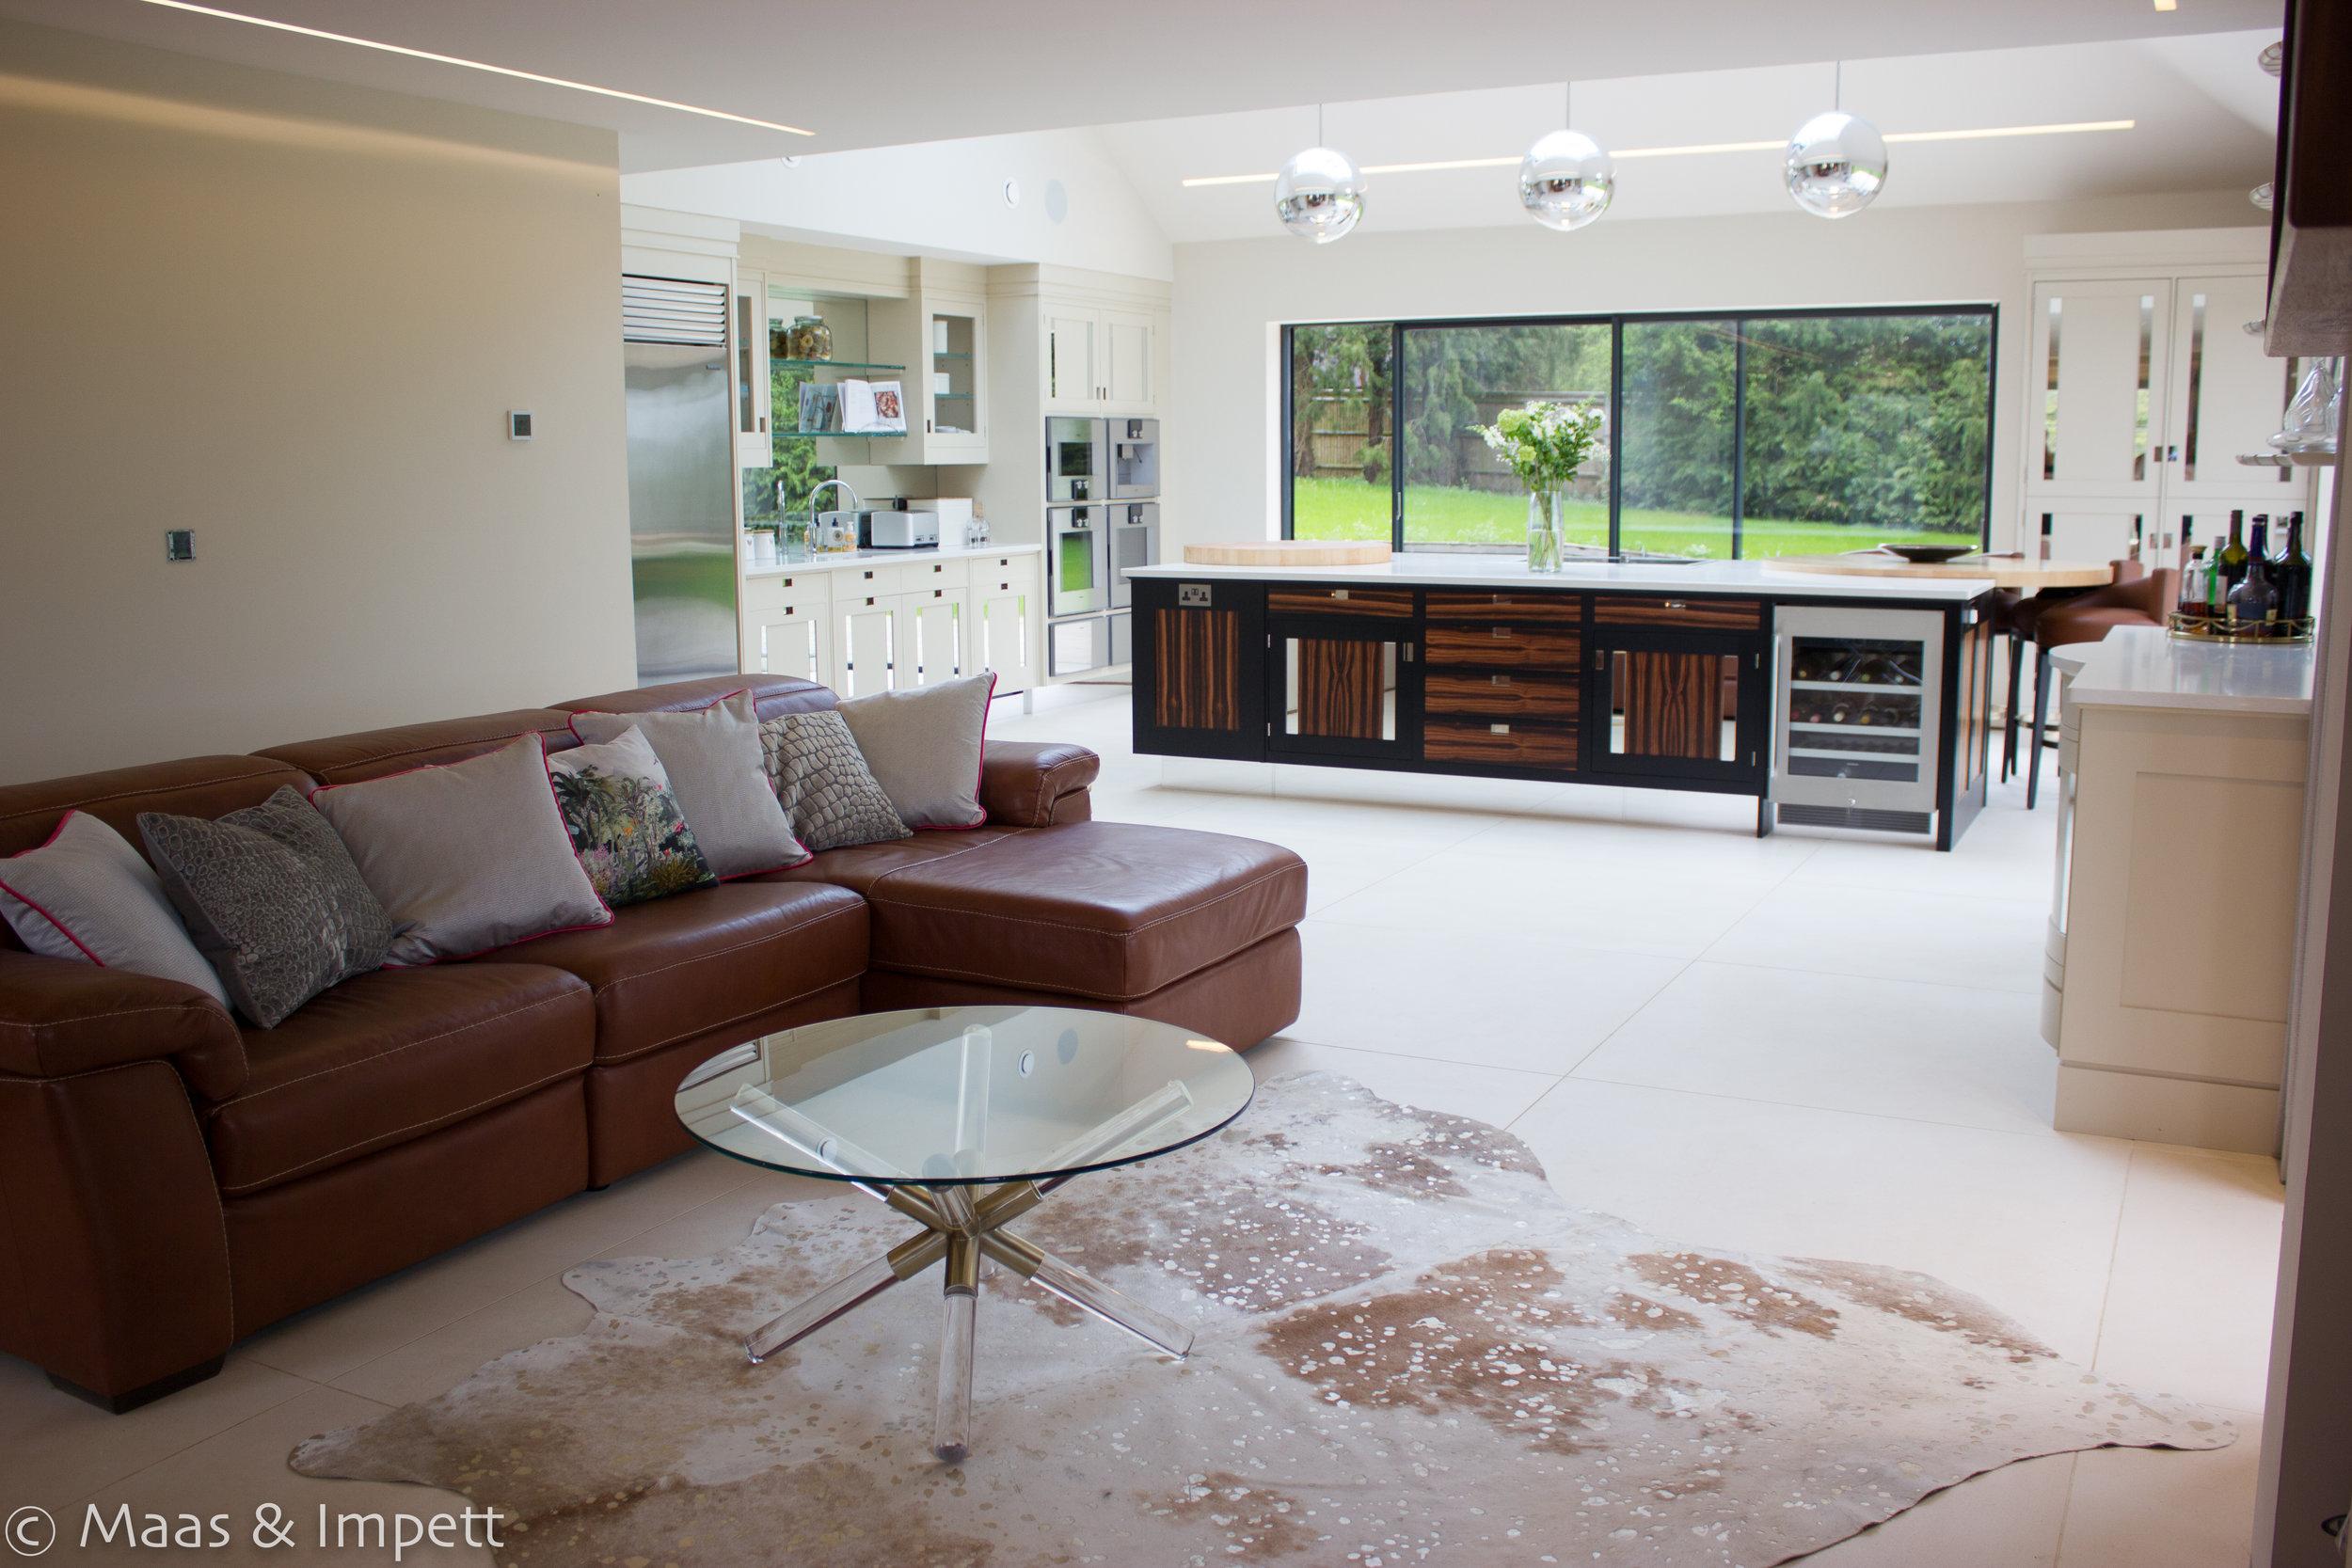 Glamorous Interiors by Maas & Impett